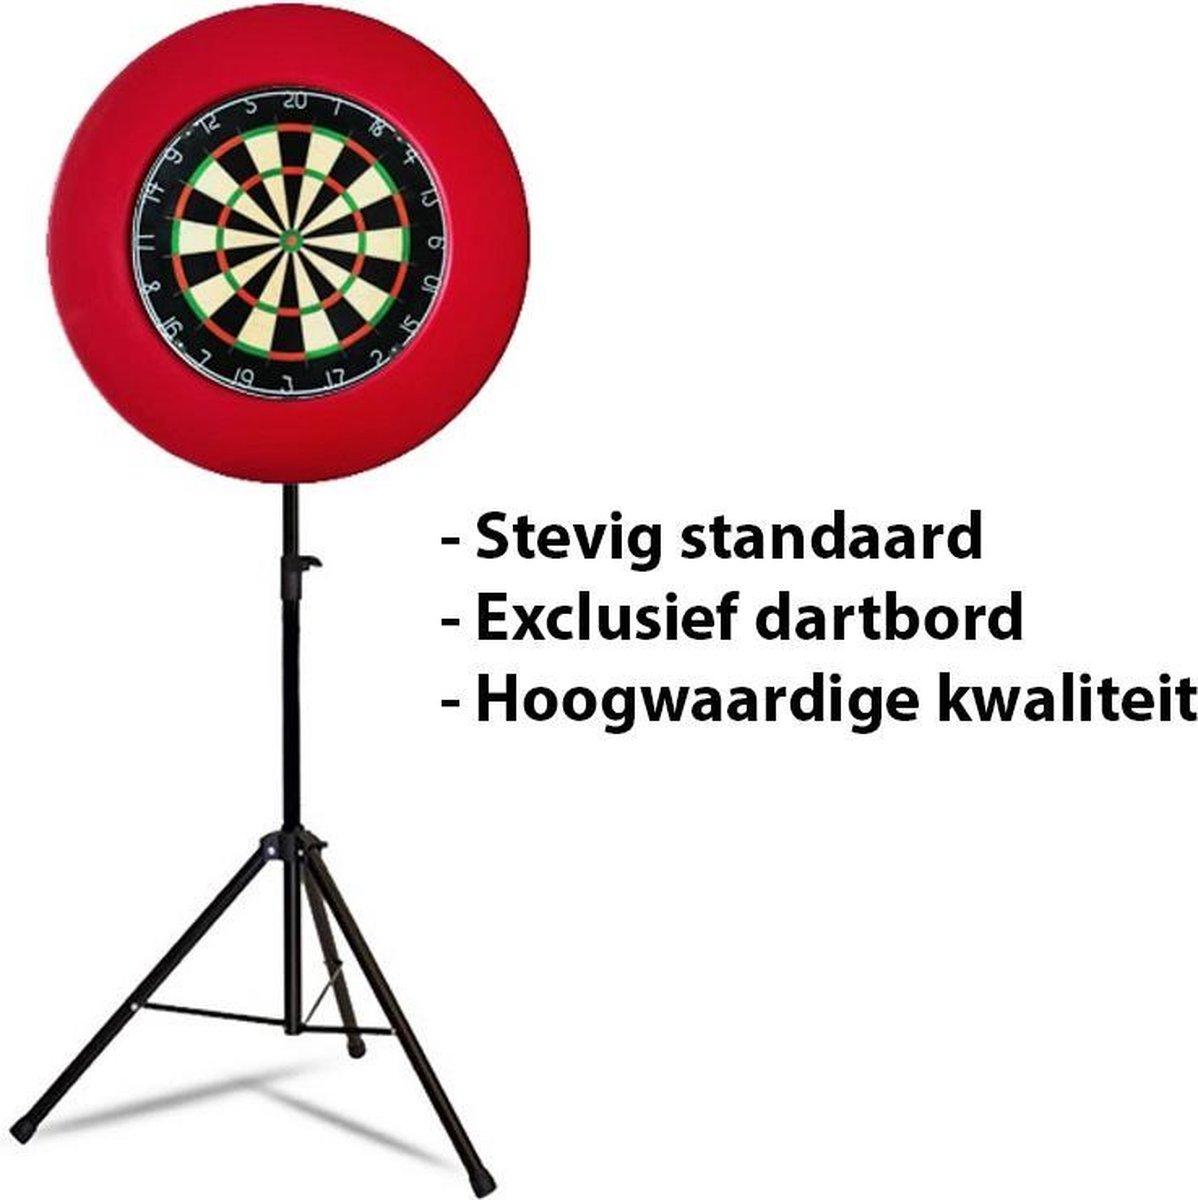 Dragon darts - Portable dartbord standaard - dartbord standaard